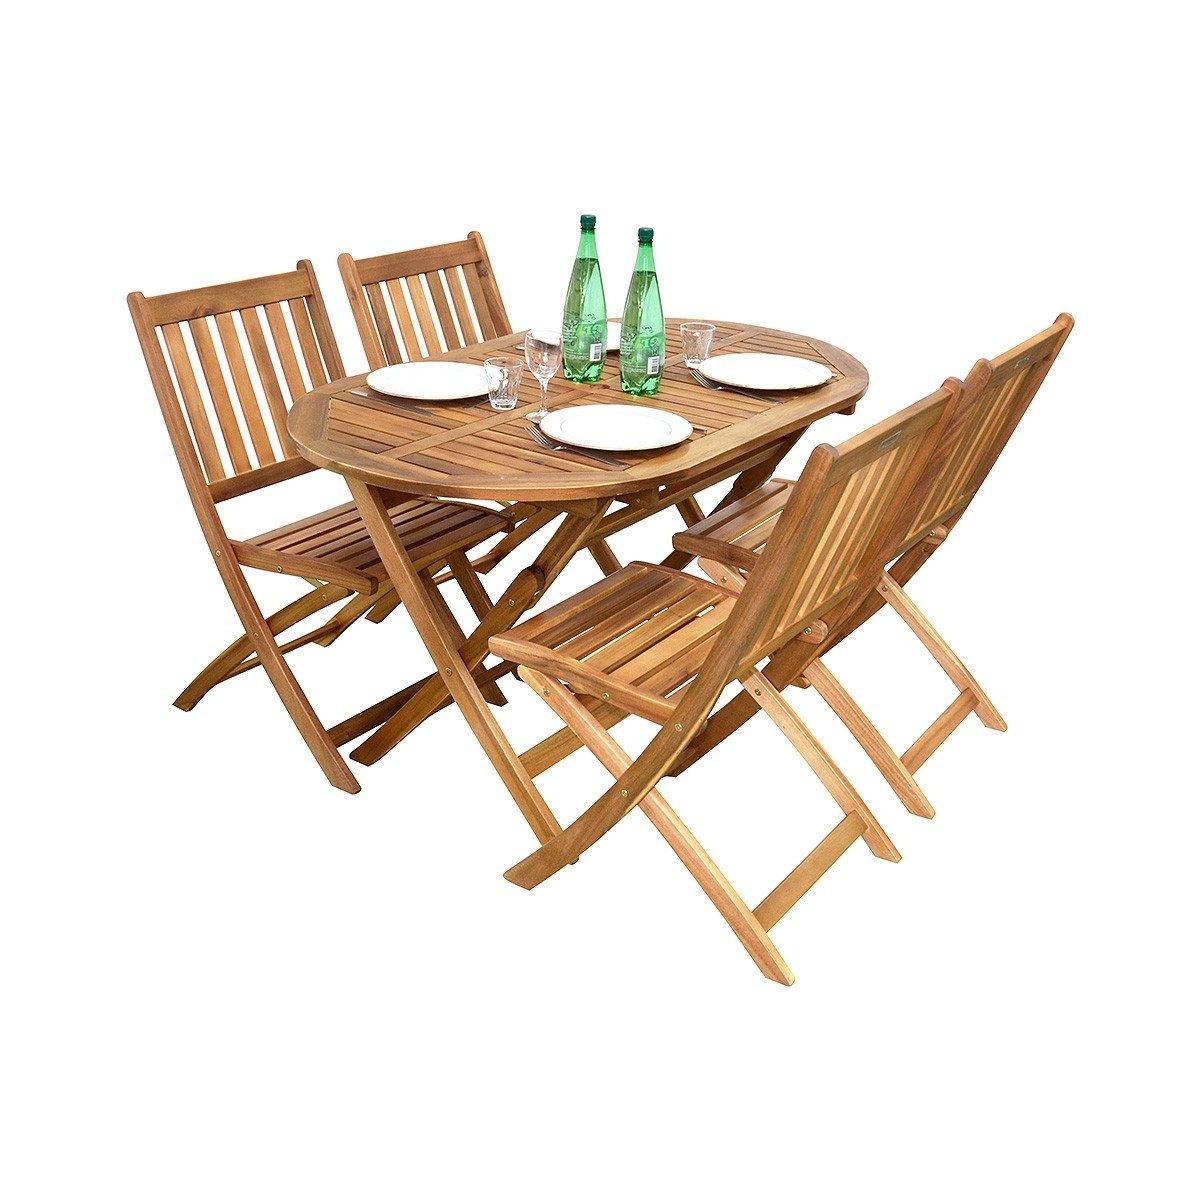 Salon De Jardin Ovale Fidgi En Acacia 4 Places - Achat/vente ... destiné Housse De Table De Jardin Ovale